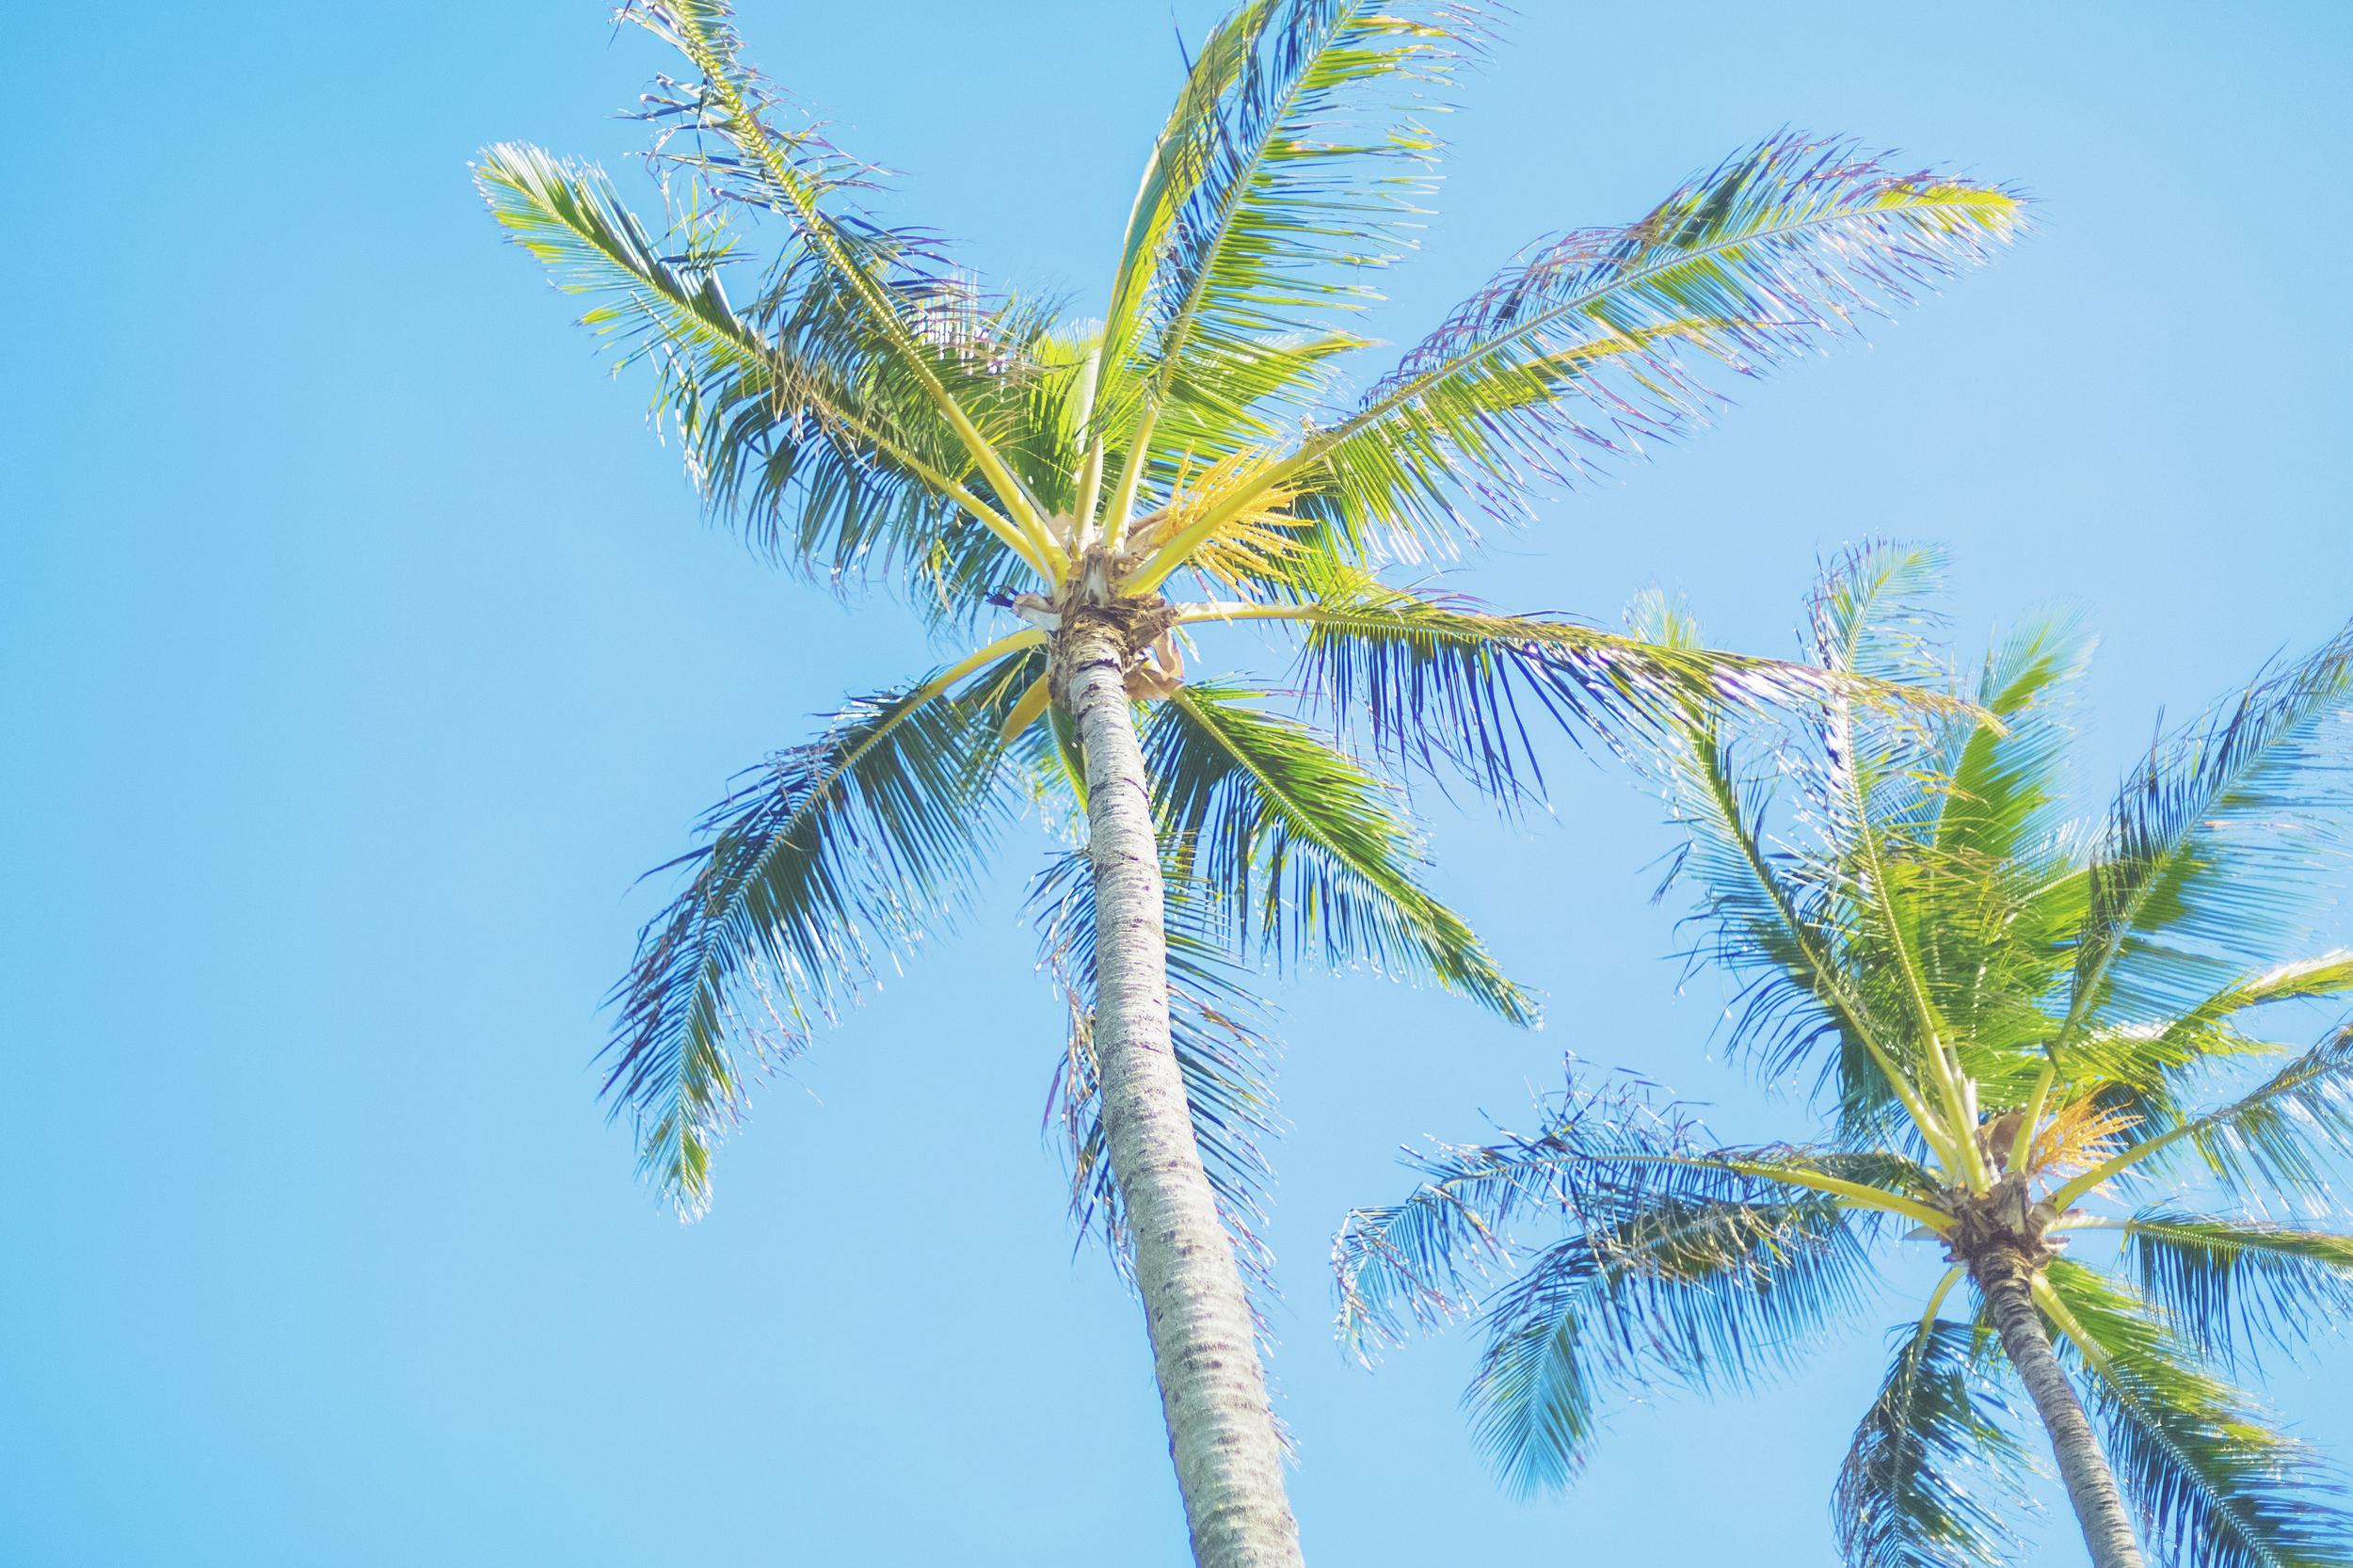 angie-diaz-photography-maui-honeymoon-hawaii-elopement-14.jpg